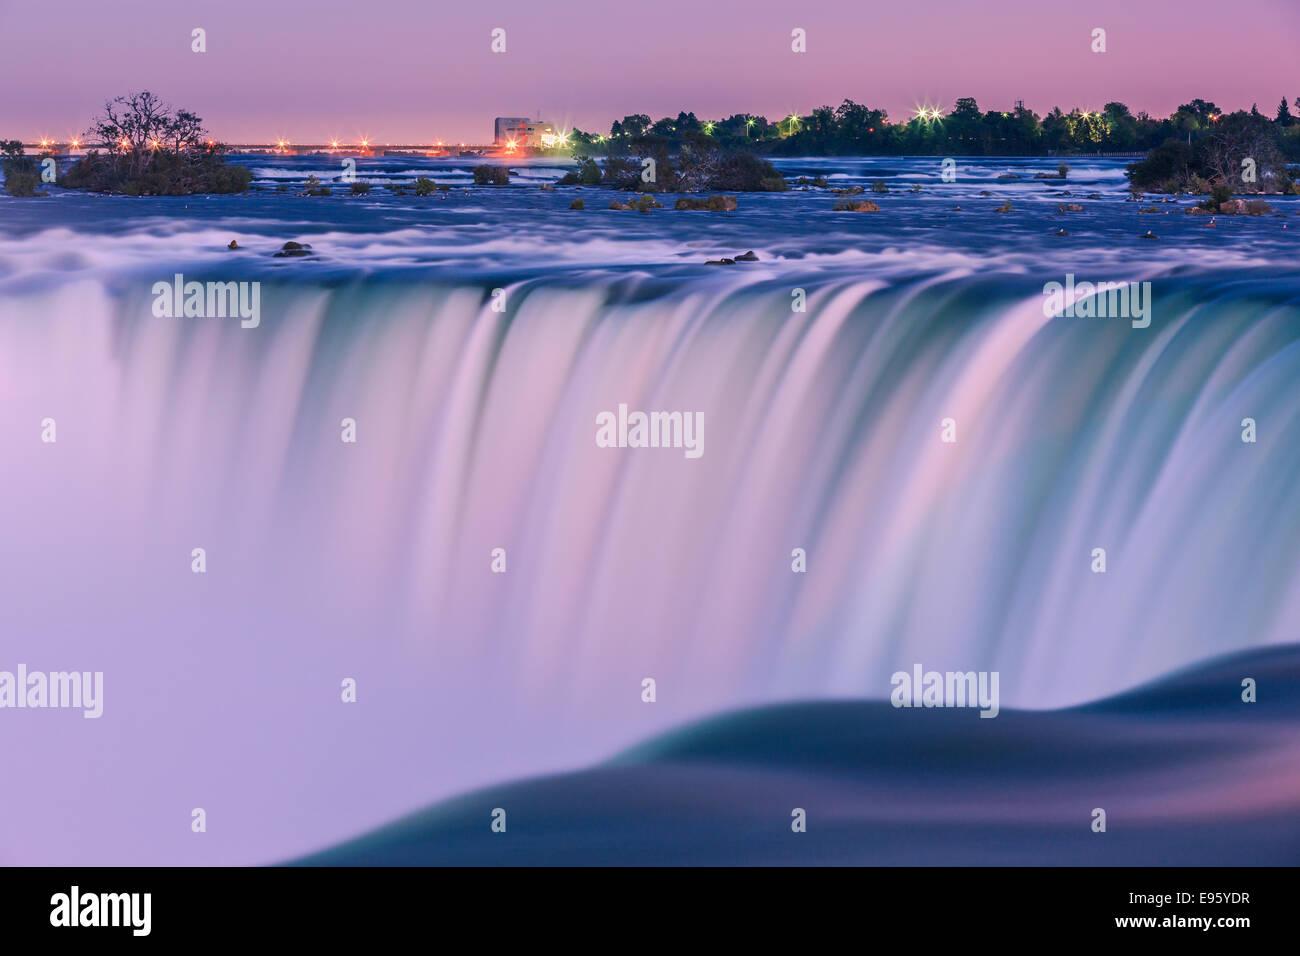 Horseshoe Falls, part of the Niagara Falls, Ontario, Canada. - Stock Image